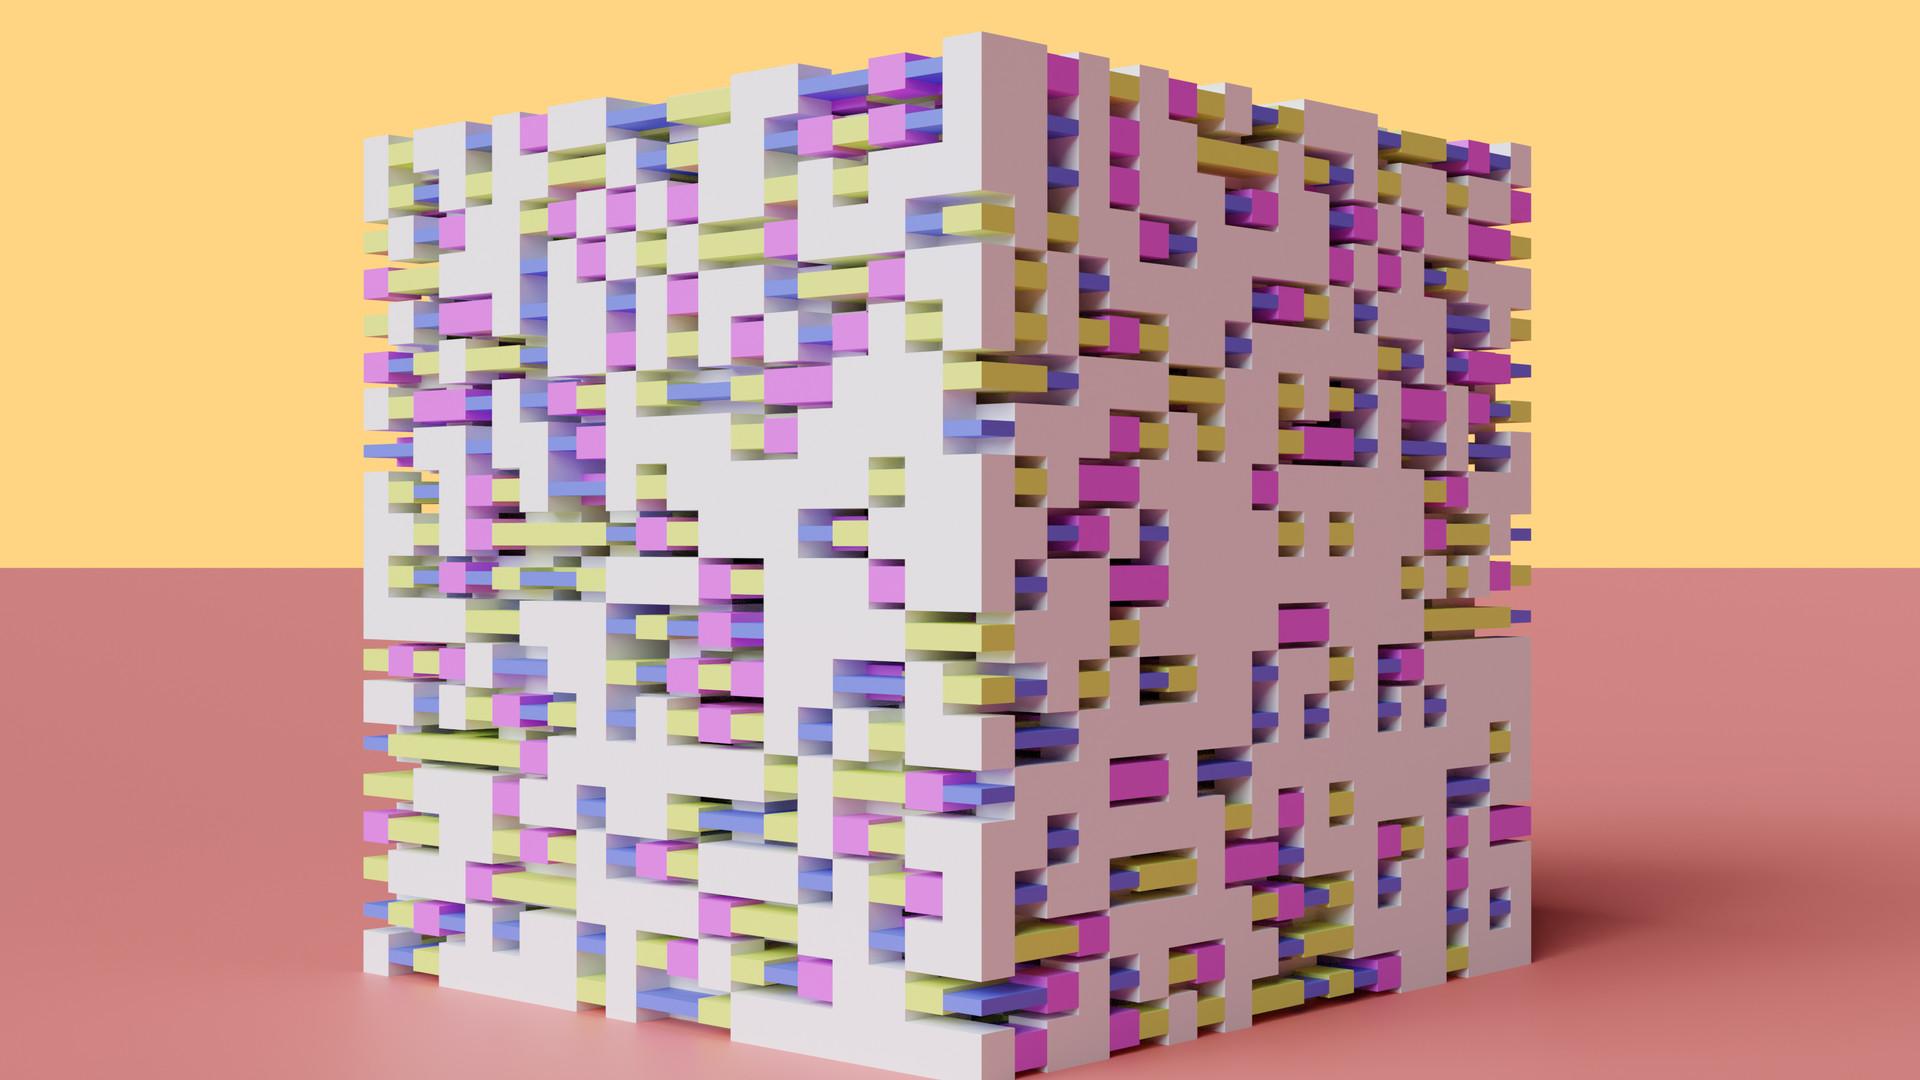 Cubes and Cuboids 2